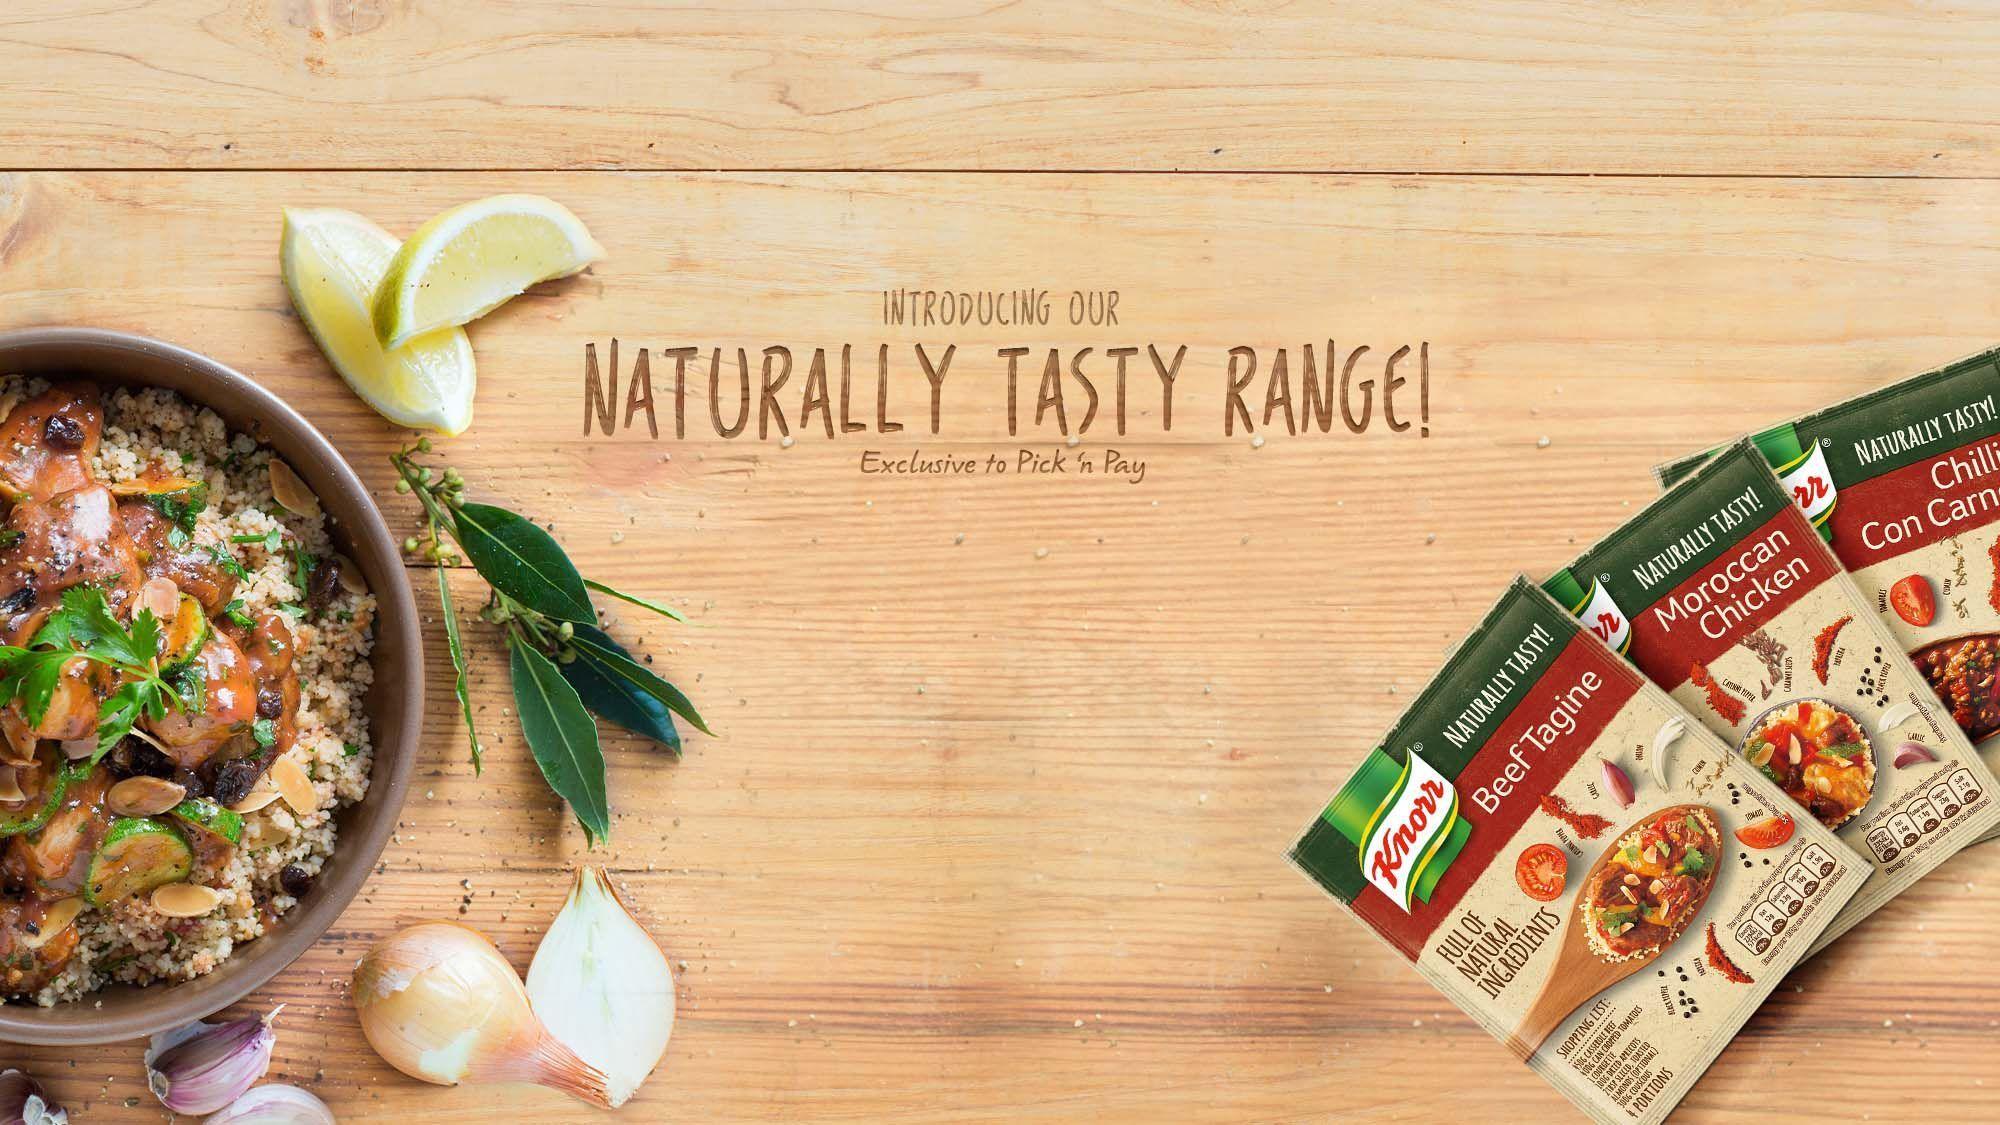 Knorr Naturally Tasty Range